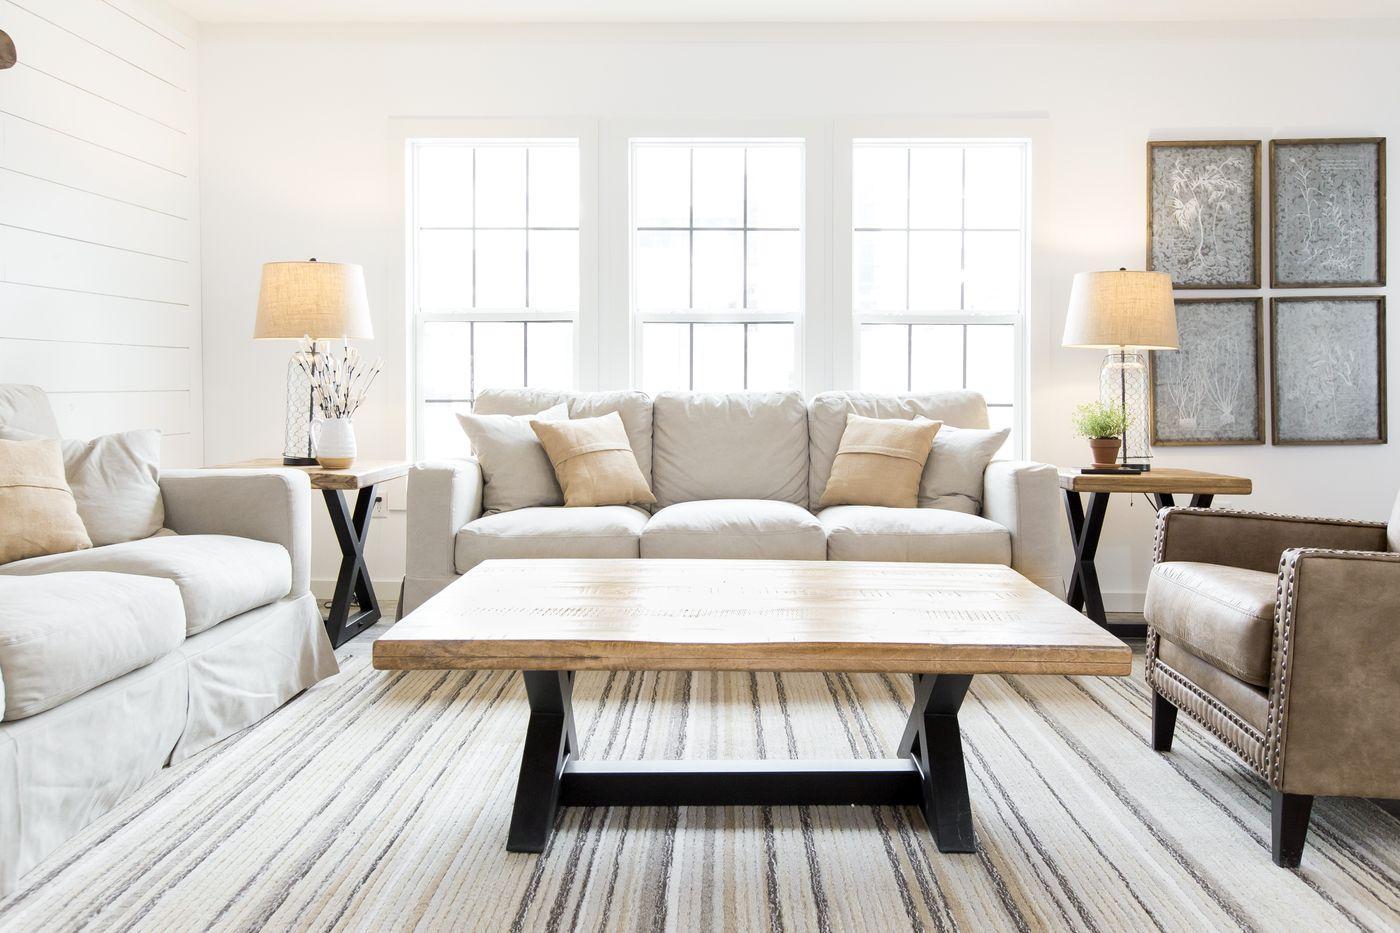 The Lulamae Living Room